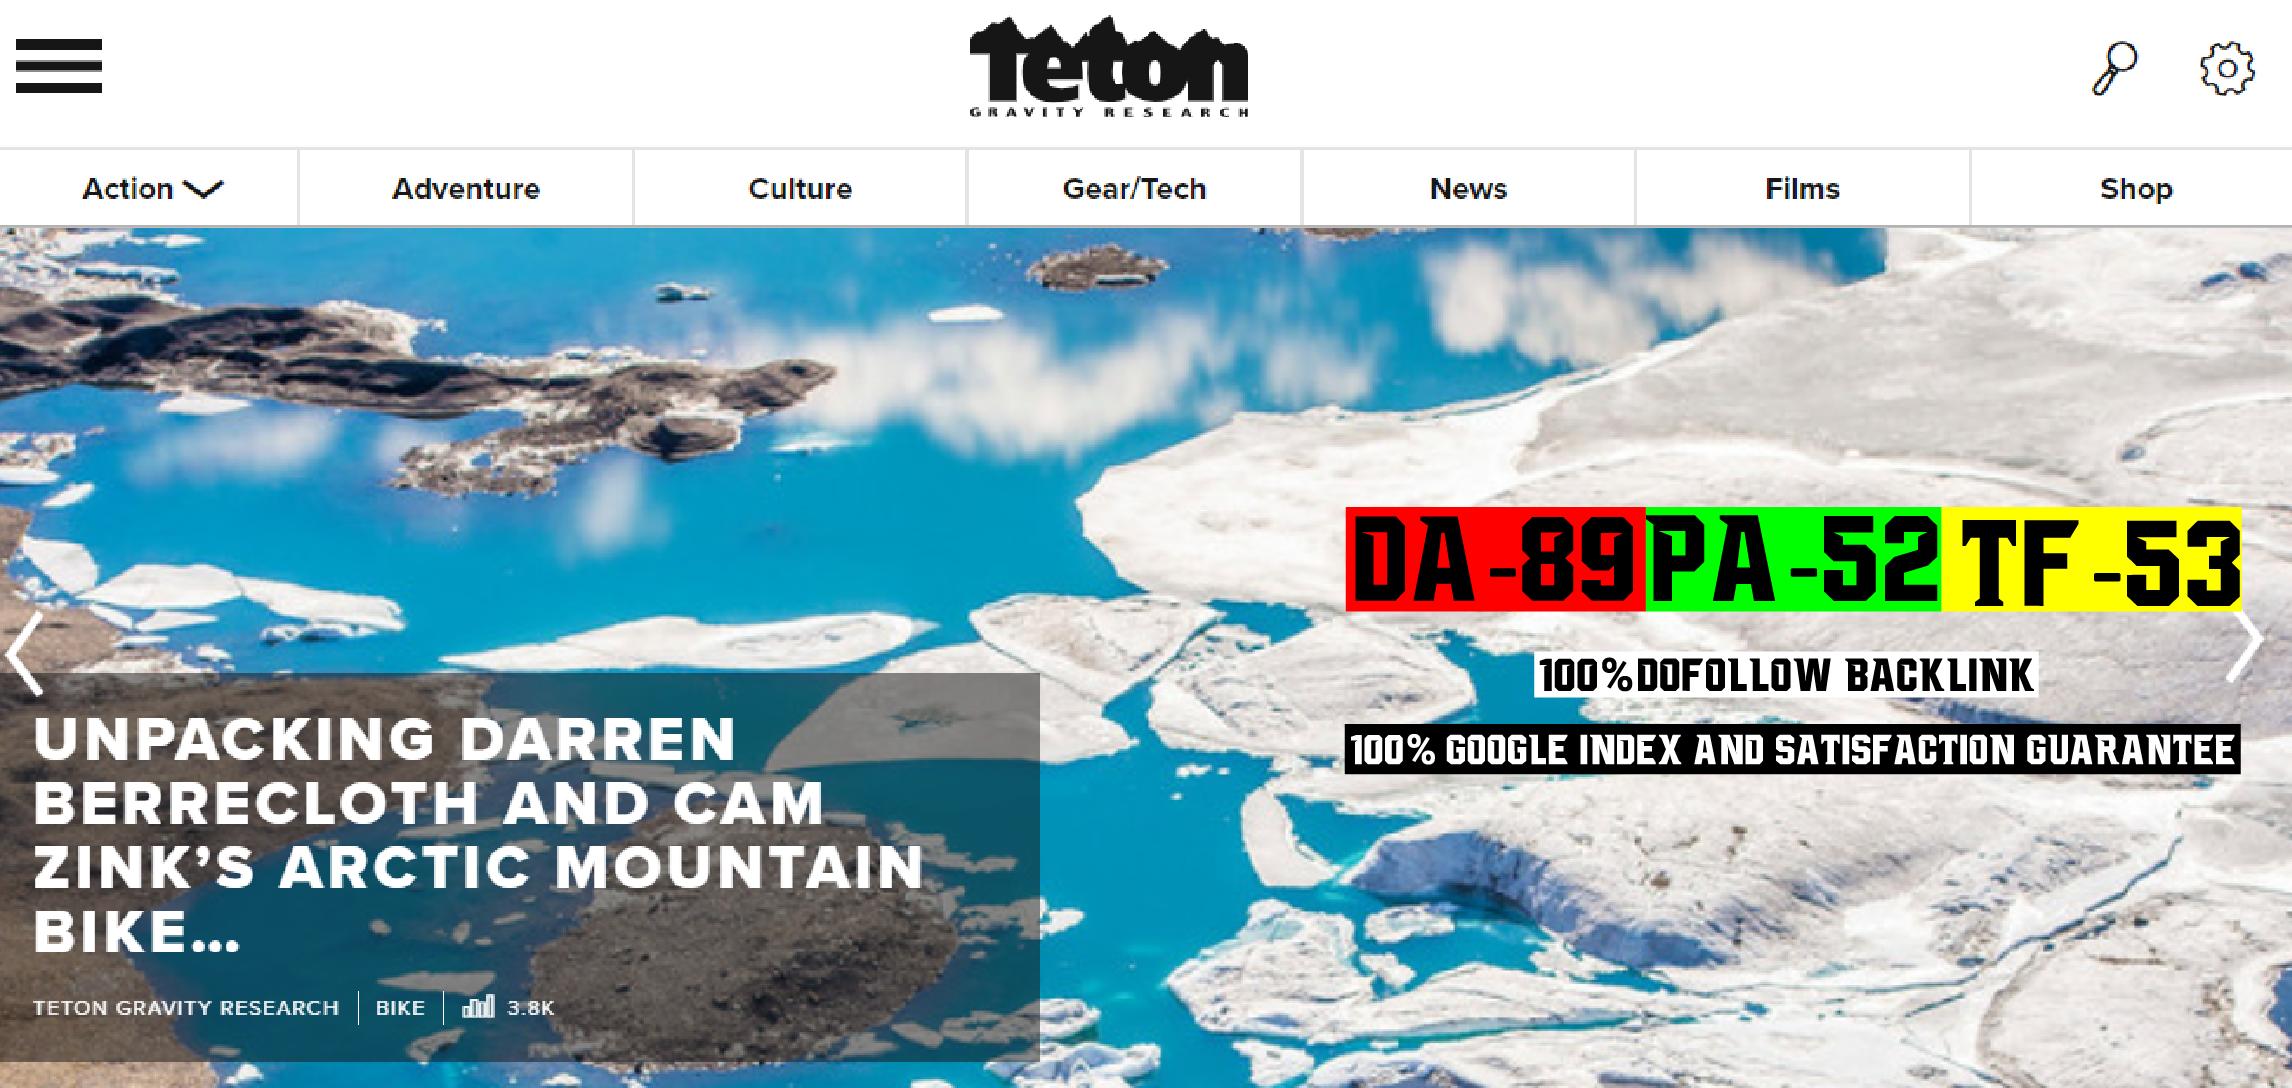 Premium Guest Posting Service On My Sport Blog Tetongravity. com DA89